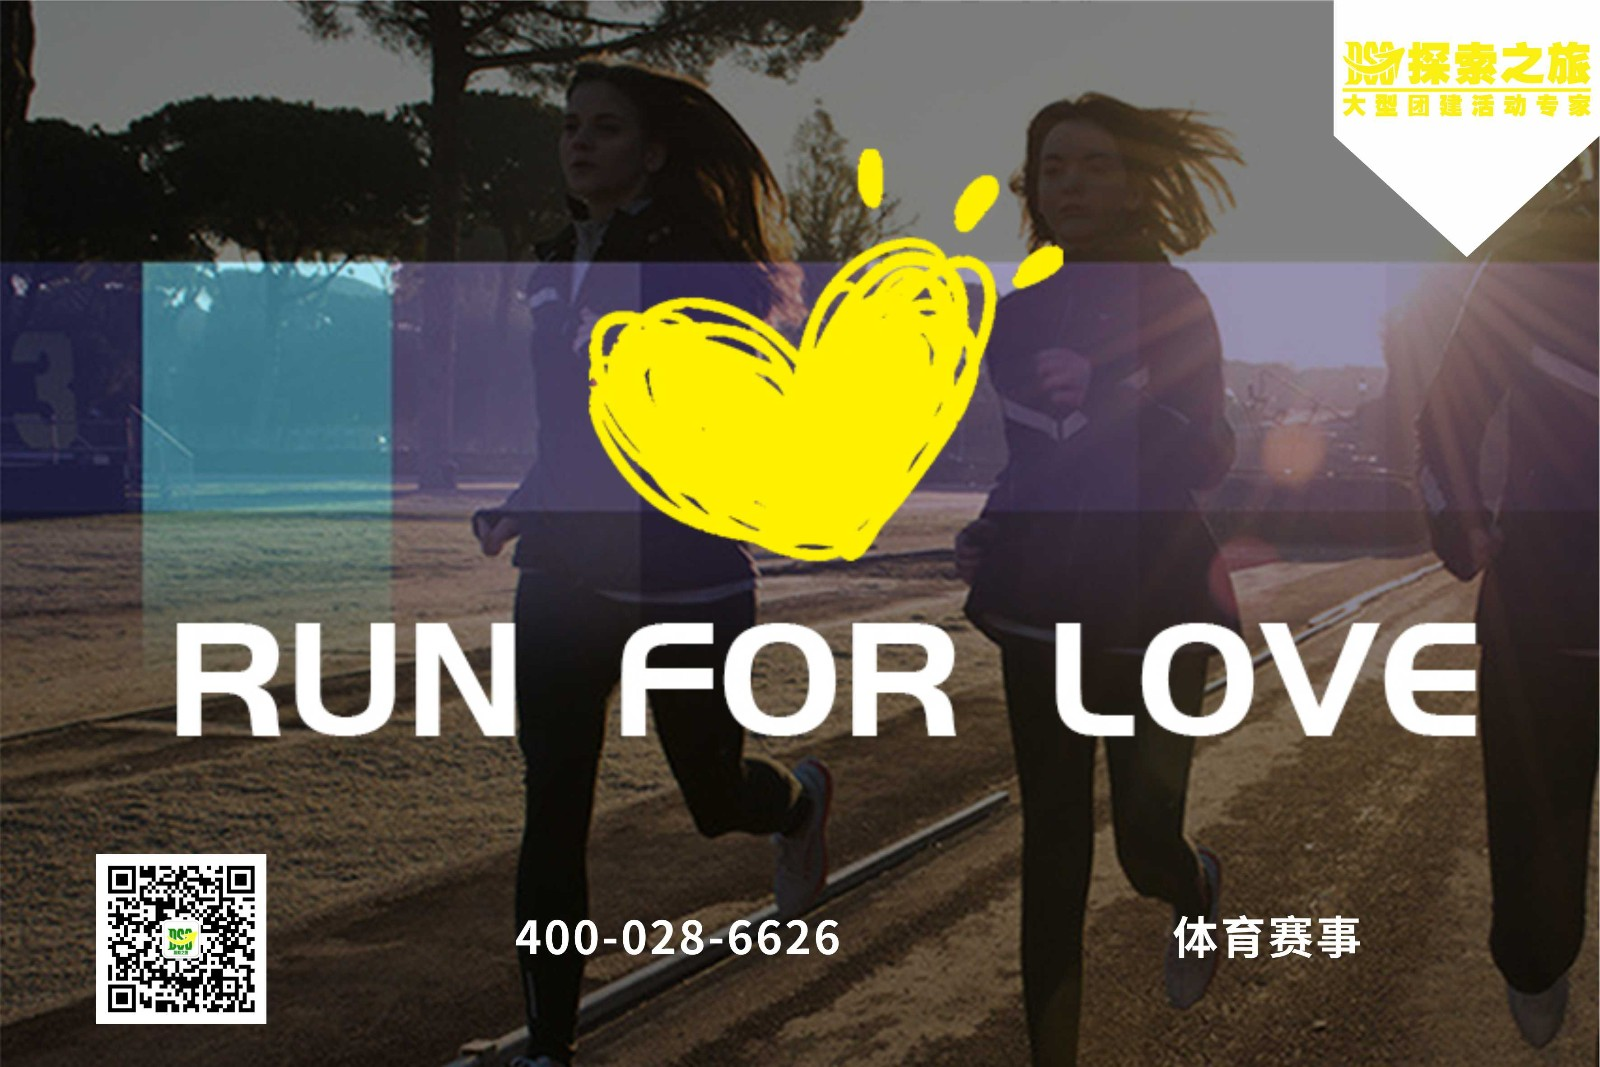 【亲子马拉松】run for love